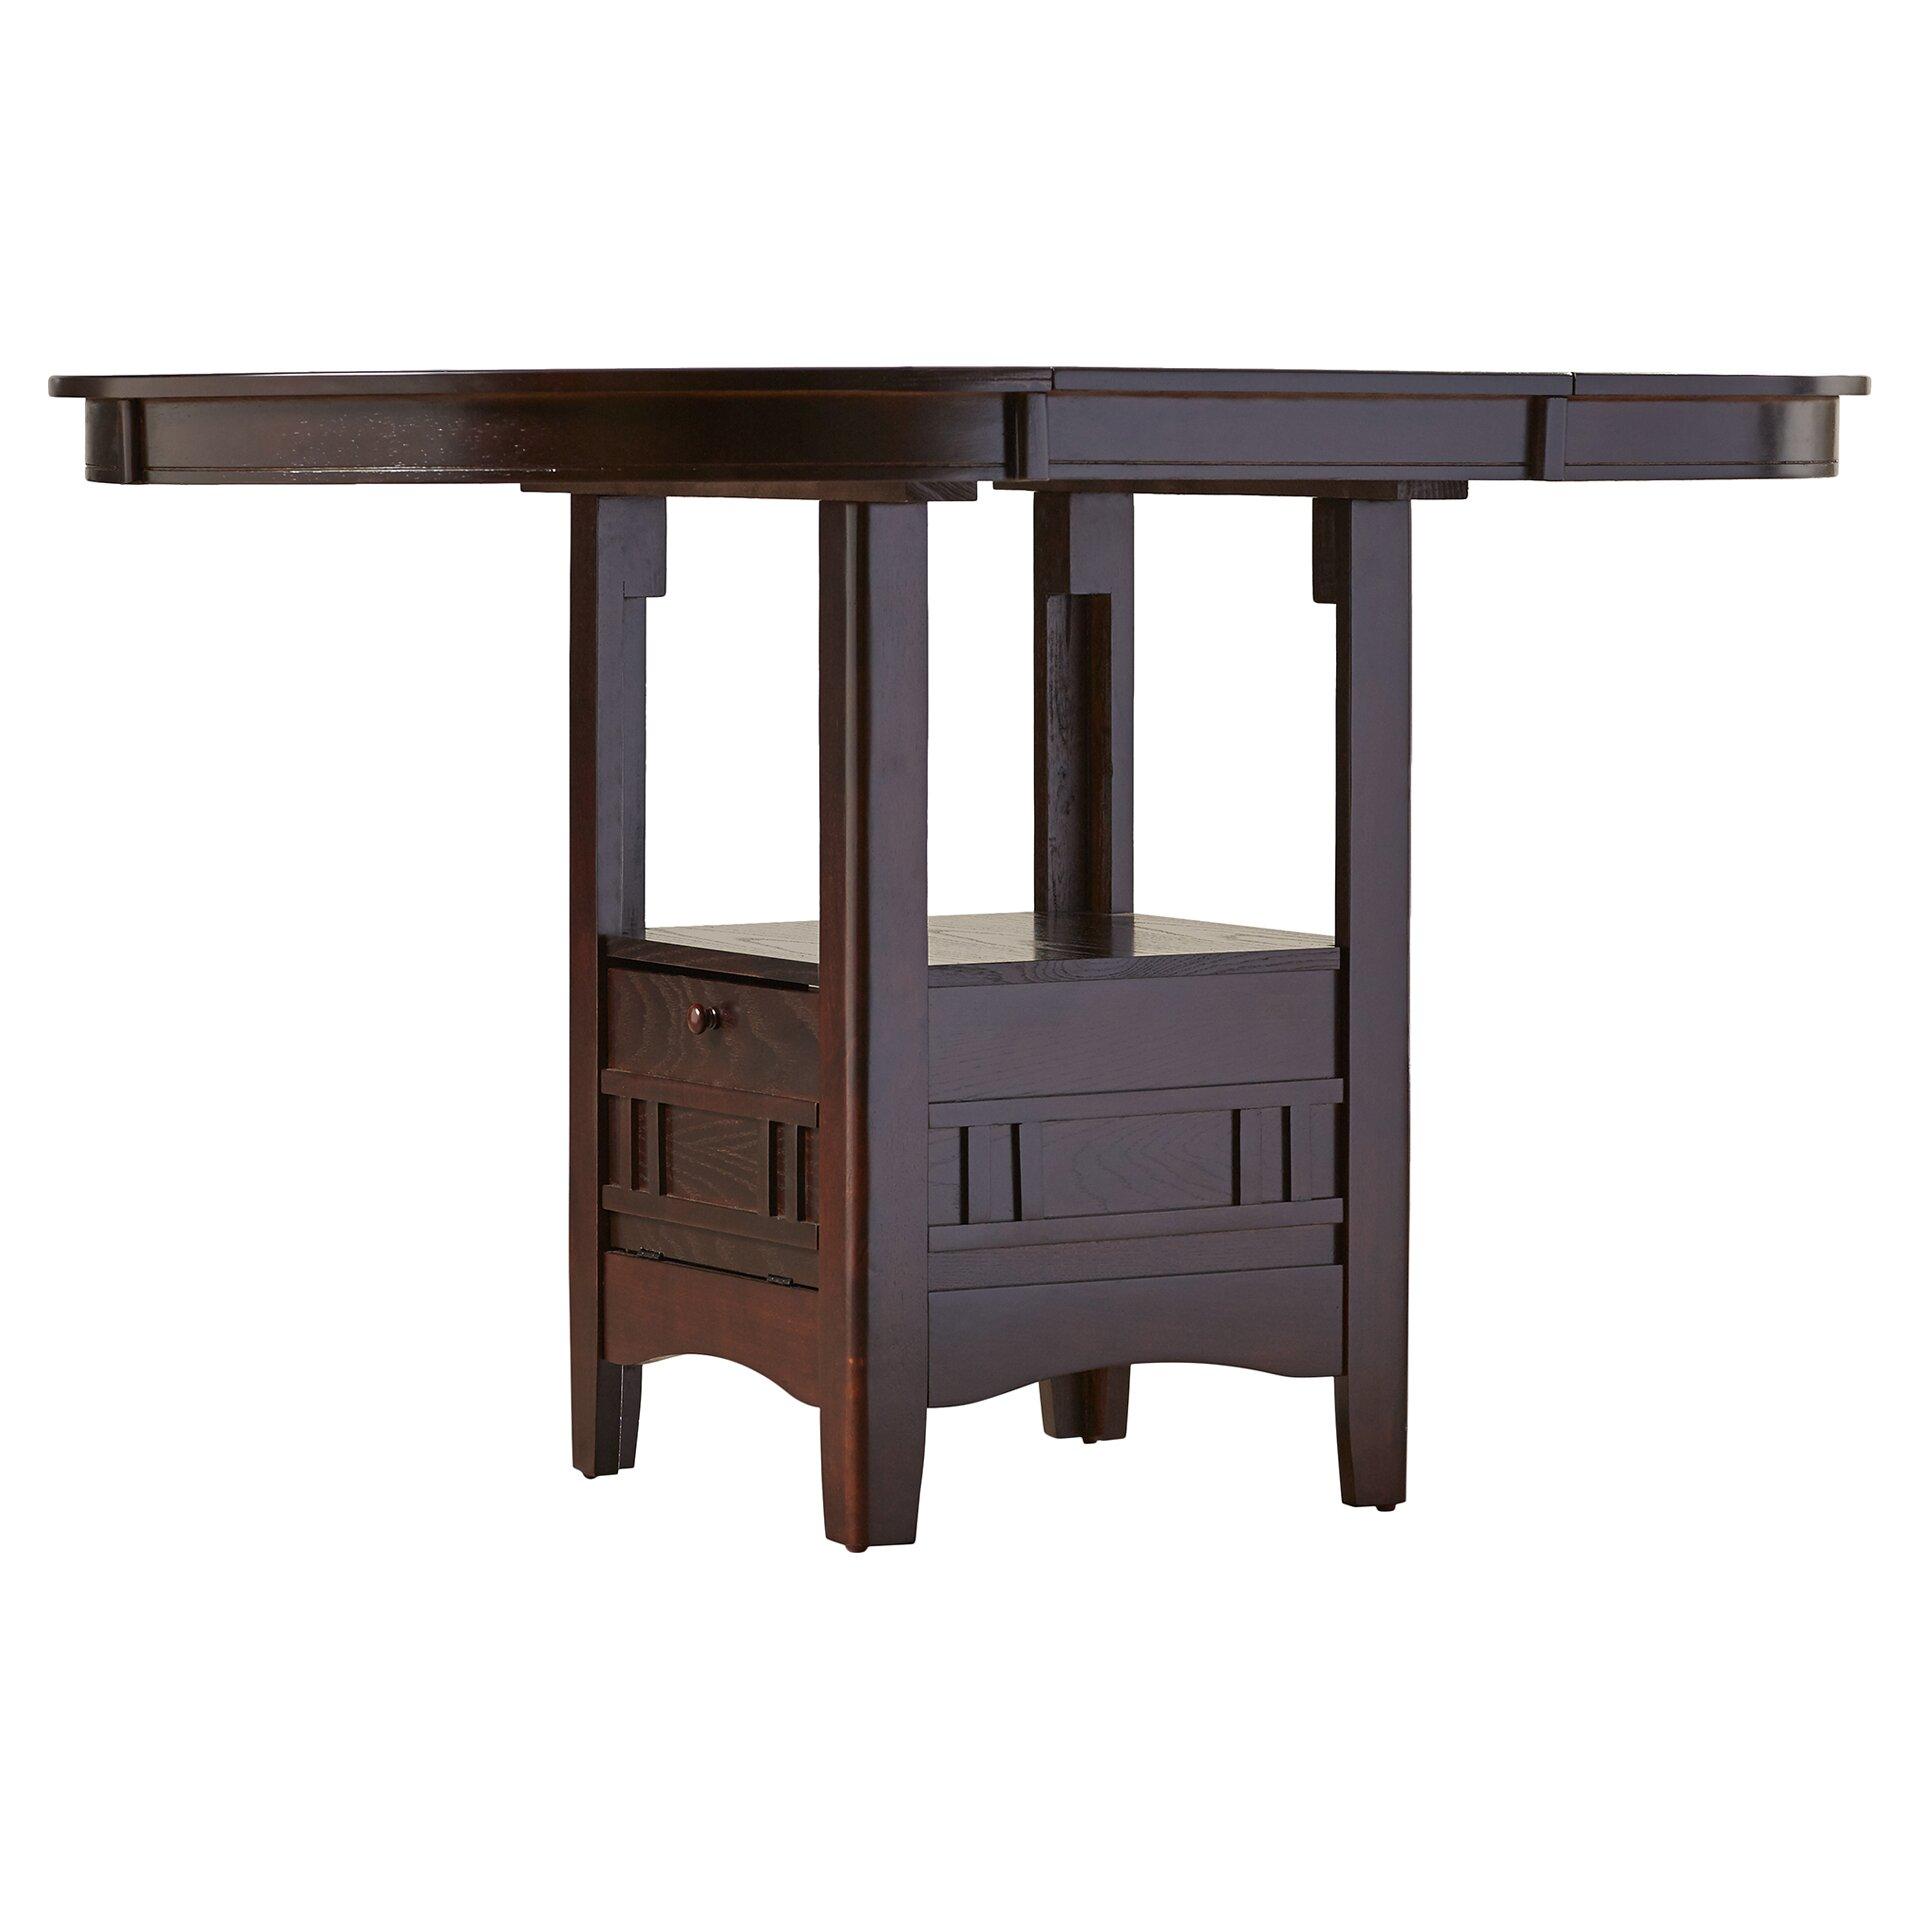 Alcott Hill Norwalk Counter Height Extendable Dining Table  : Alcott Hill25C225AE Norwalk Counter Height Extendable Dining Table from www.wayfair.com size 1920 x 1920 jpeg 213kB